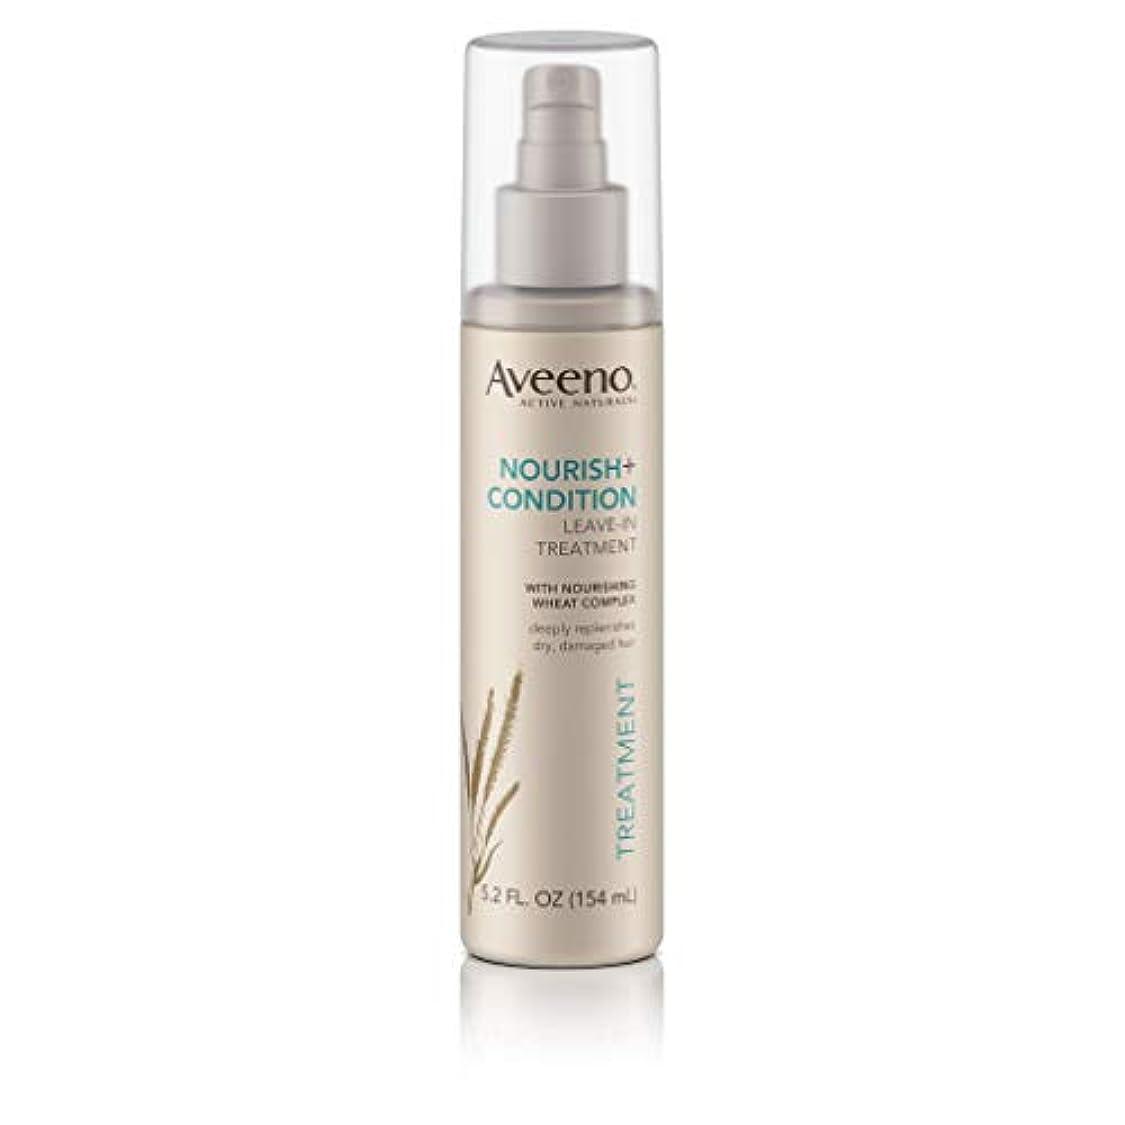 販売員債務者一般Aveeno Nourish+ Condition Treatment Spray 150g (並行輸入品)